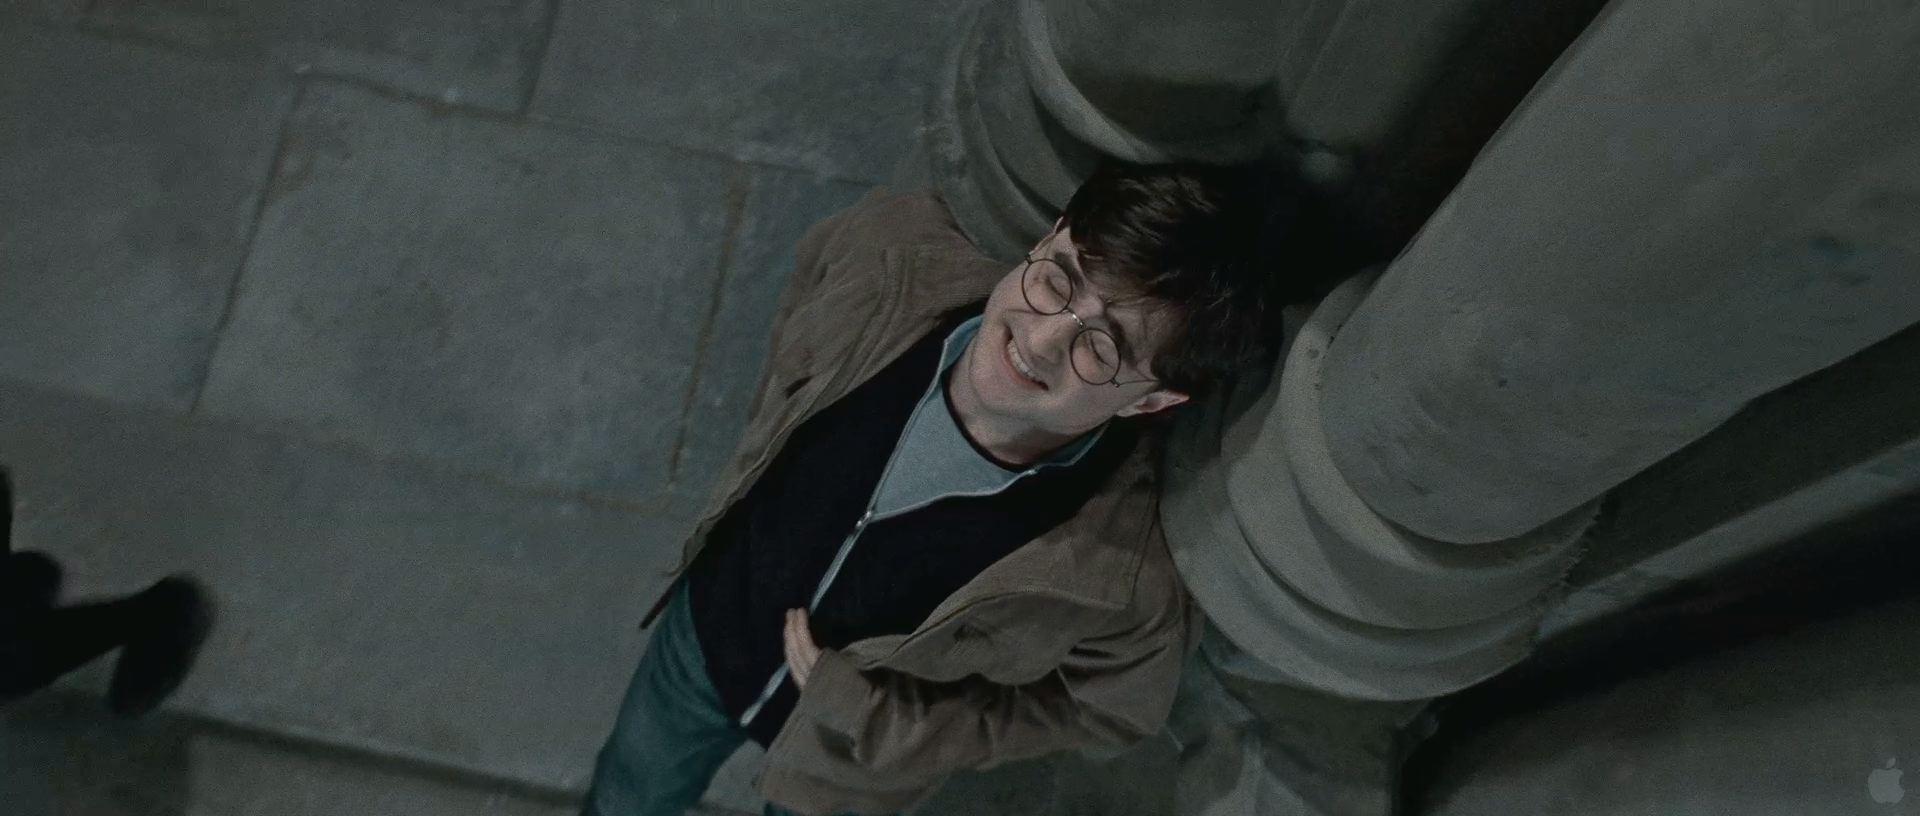 Harry Potter BlogHogwarts HP7 2 Trailer 36